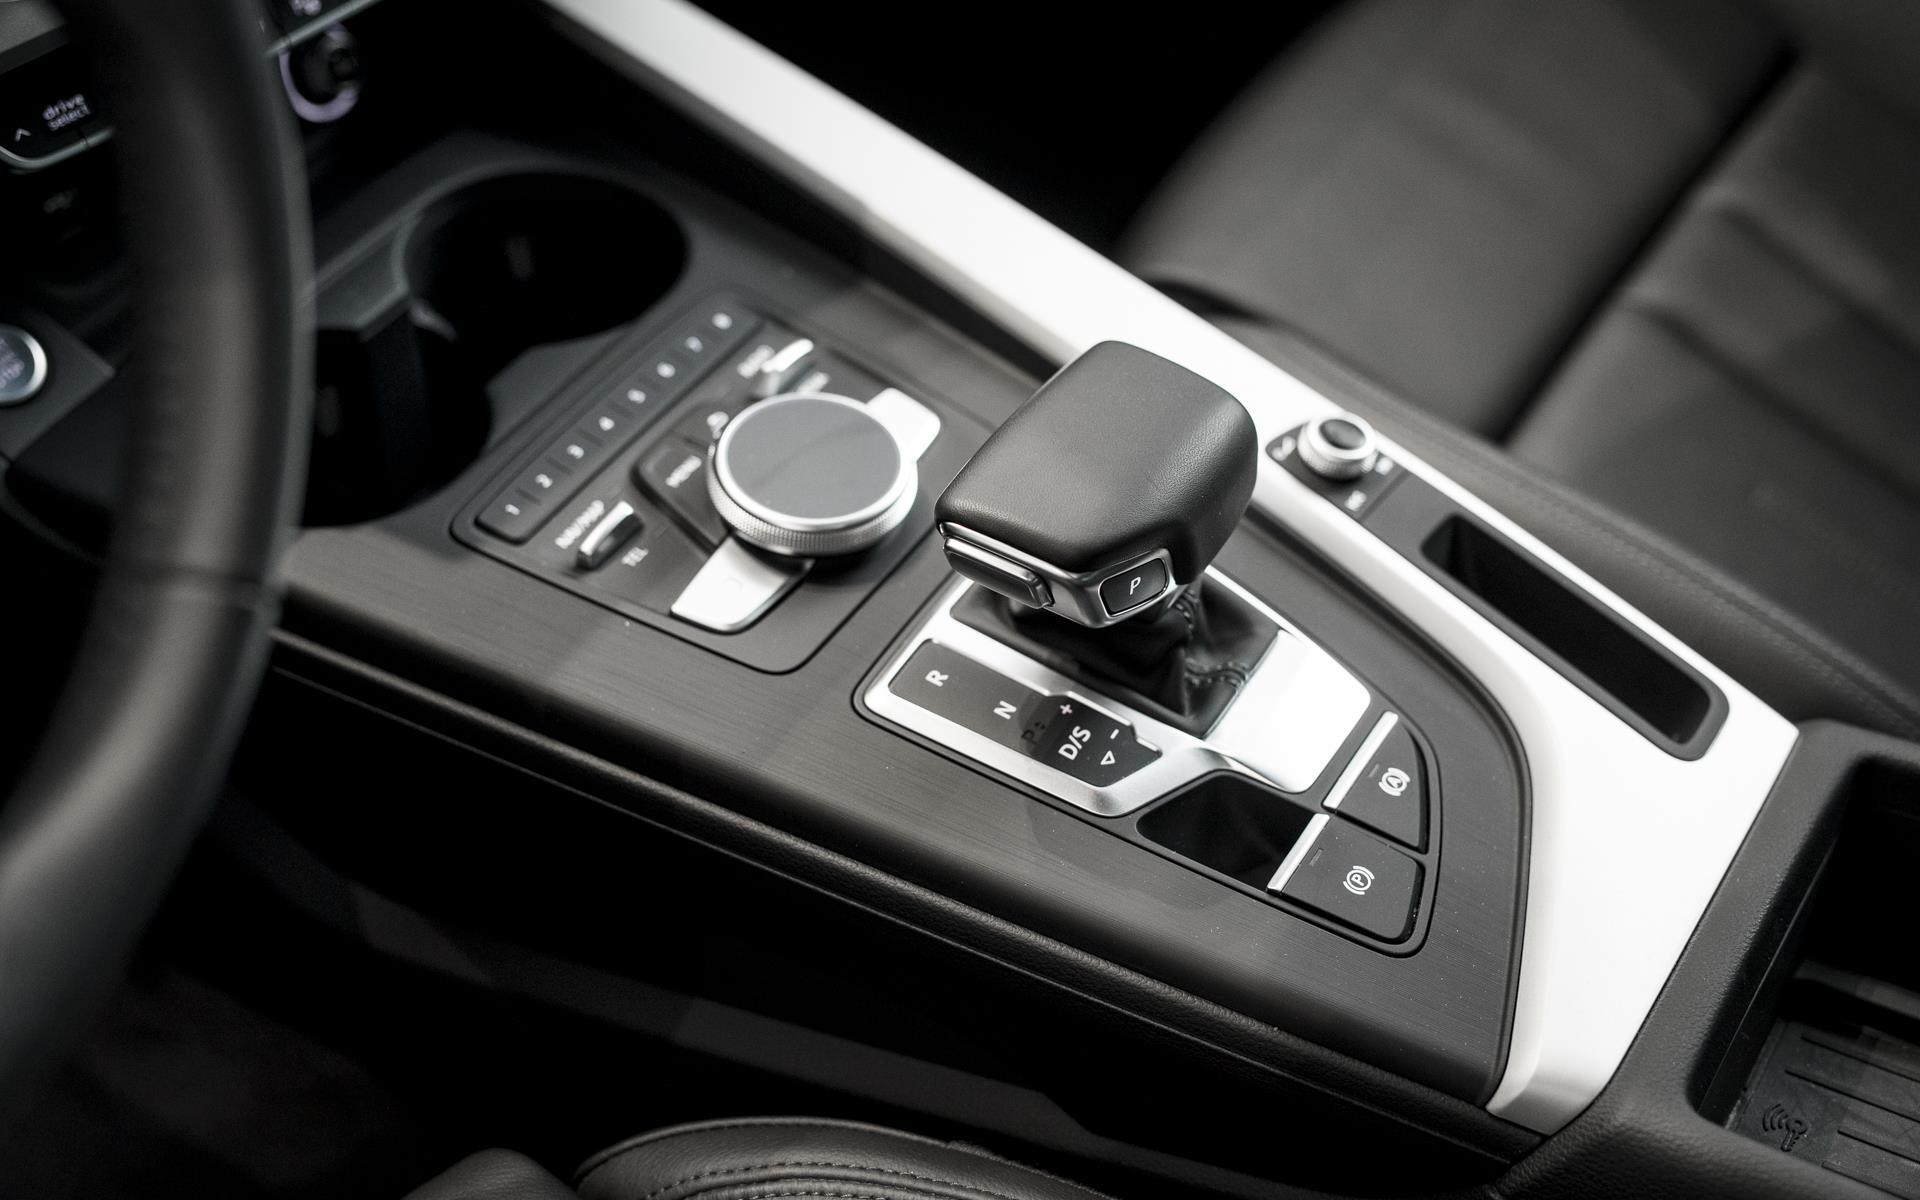 40 Avant 2,0 TDI Quattro S-Tronic 190HK Stc  image6